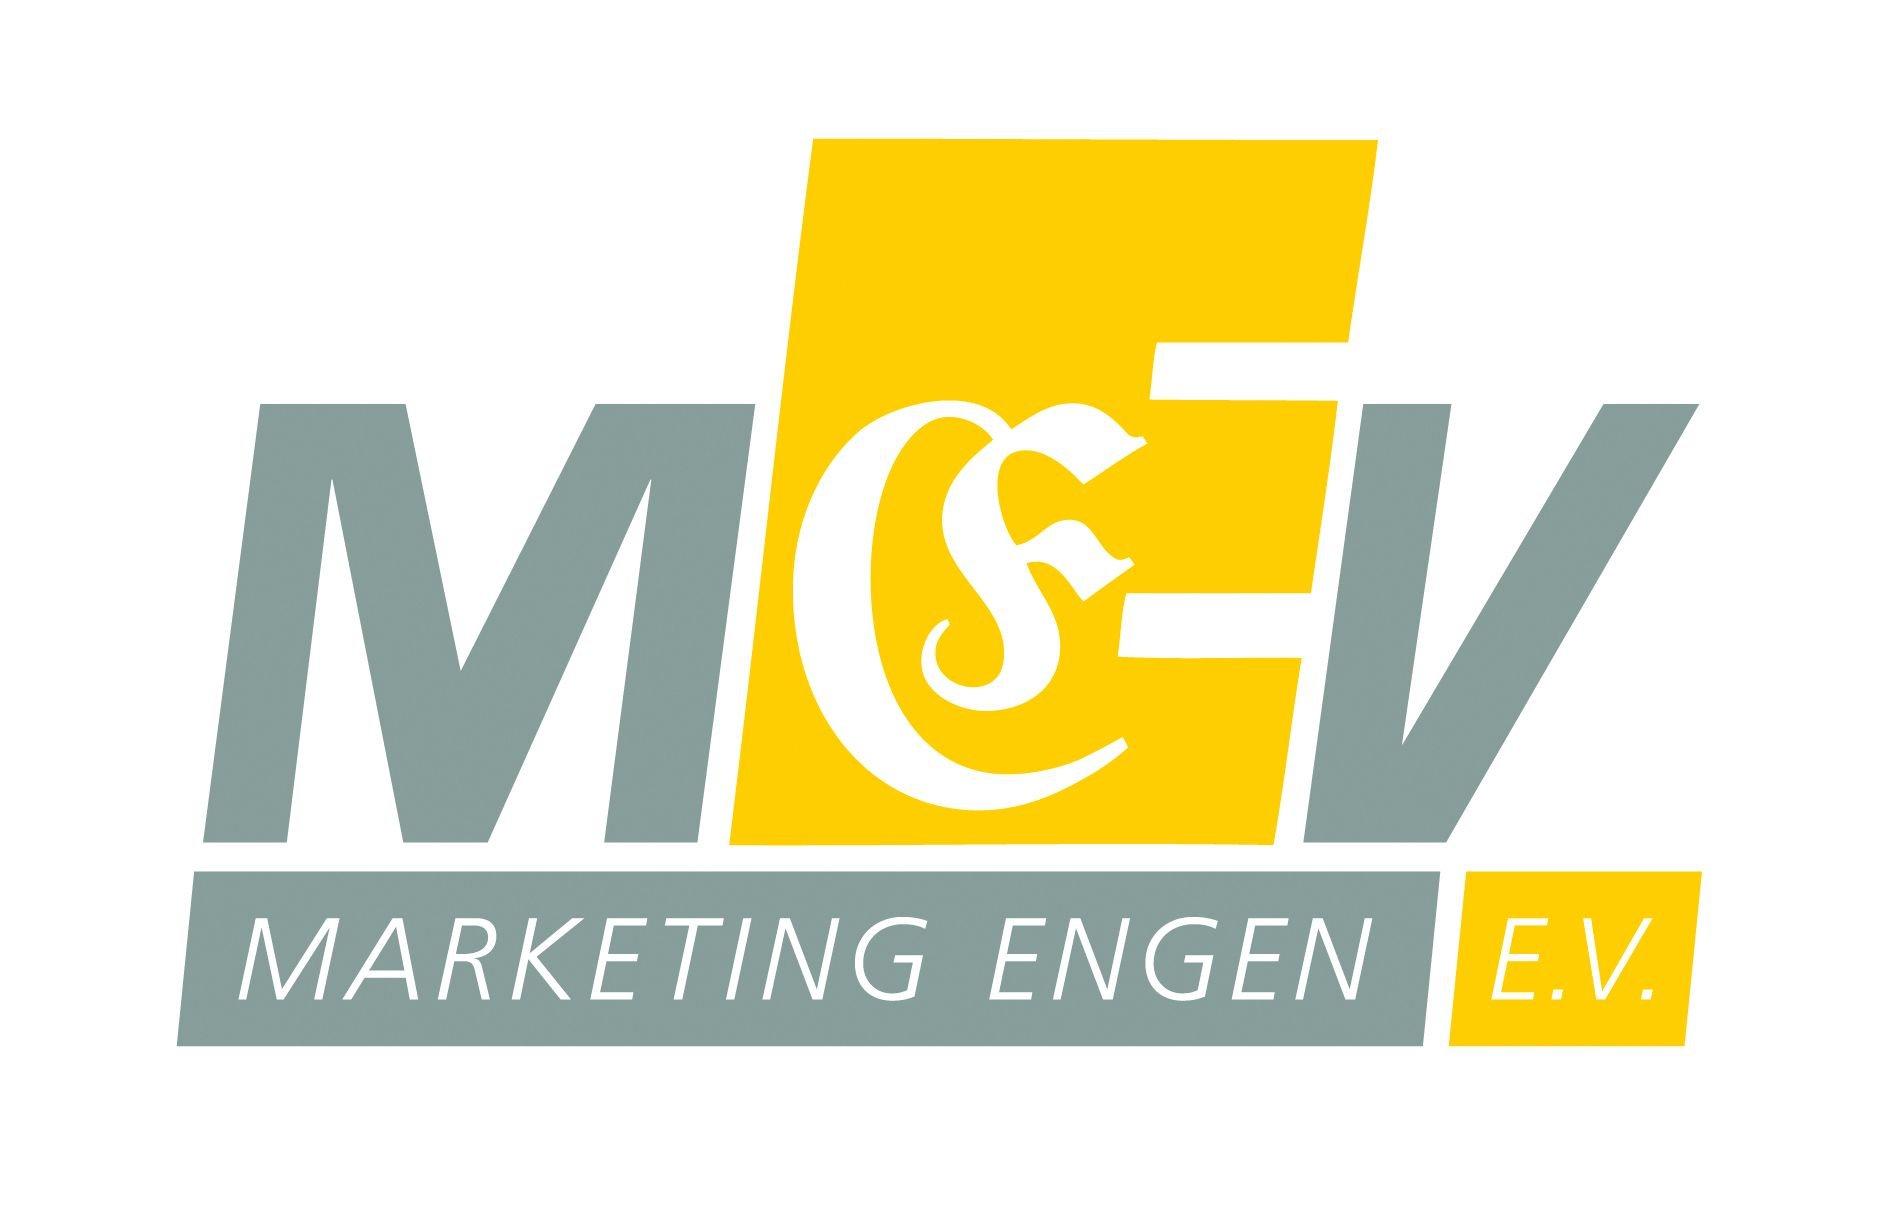 MEV Marketin Engen e.V.